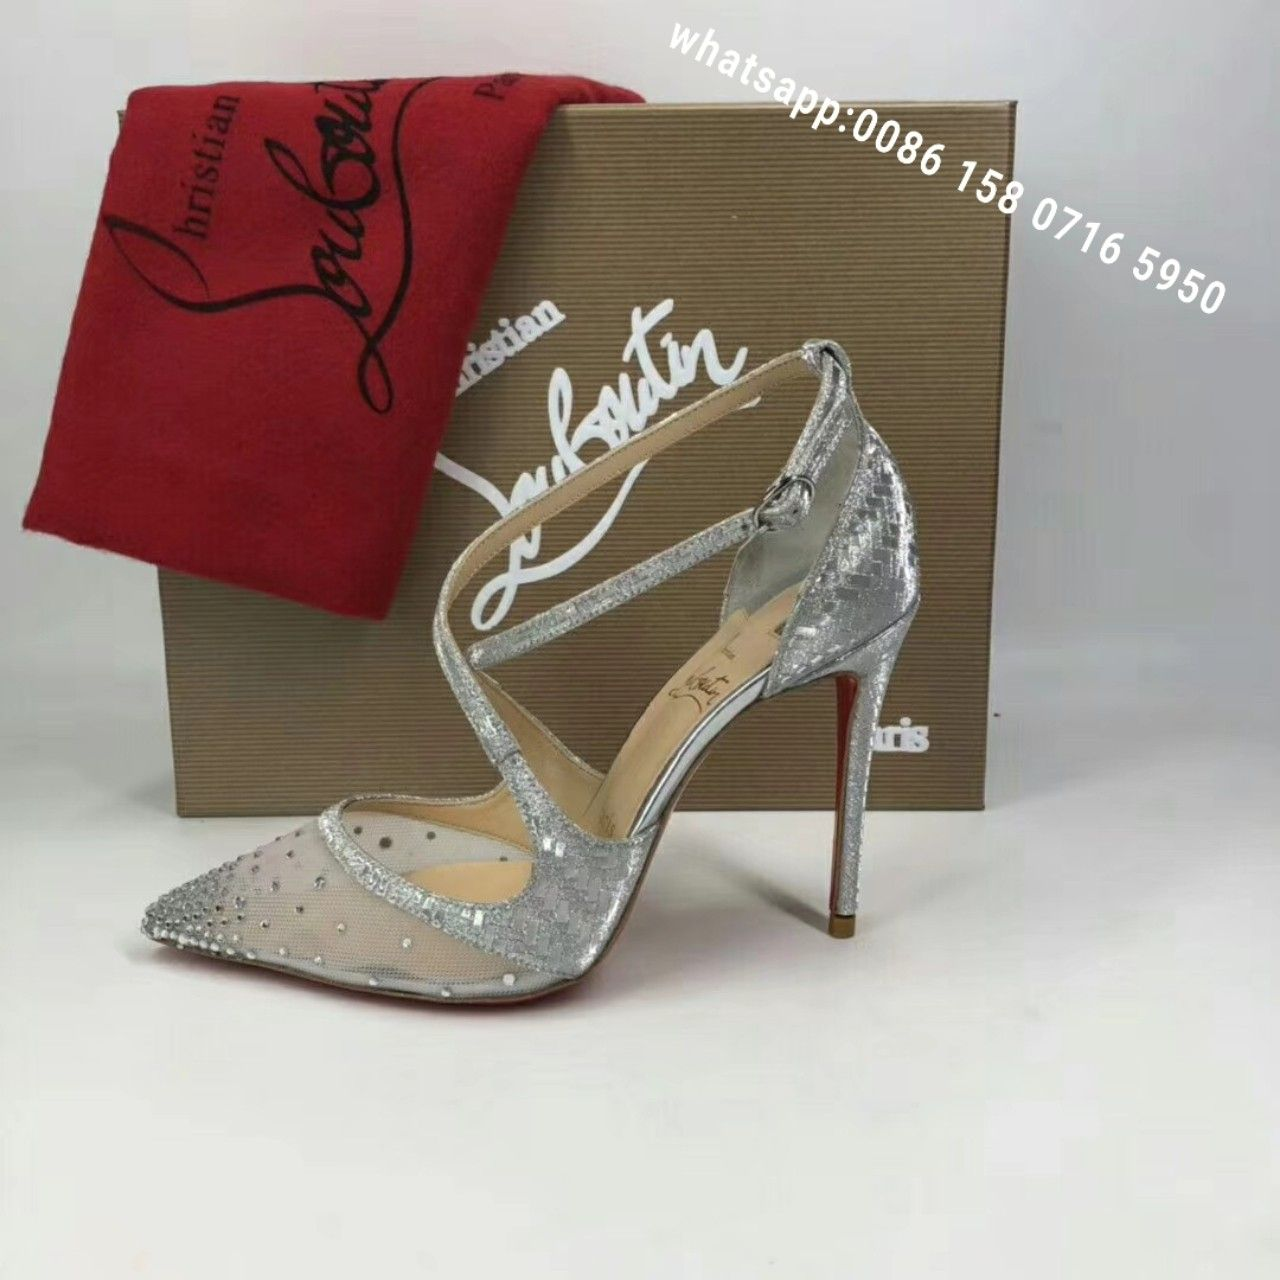 1f44348d4b3a christian louboutin twistissima strass women pumps summer shoes silver  original quality worldwide shipping